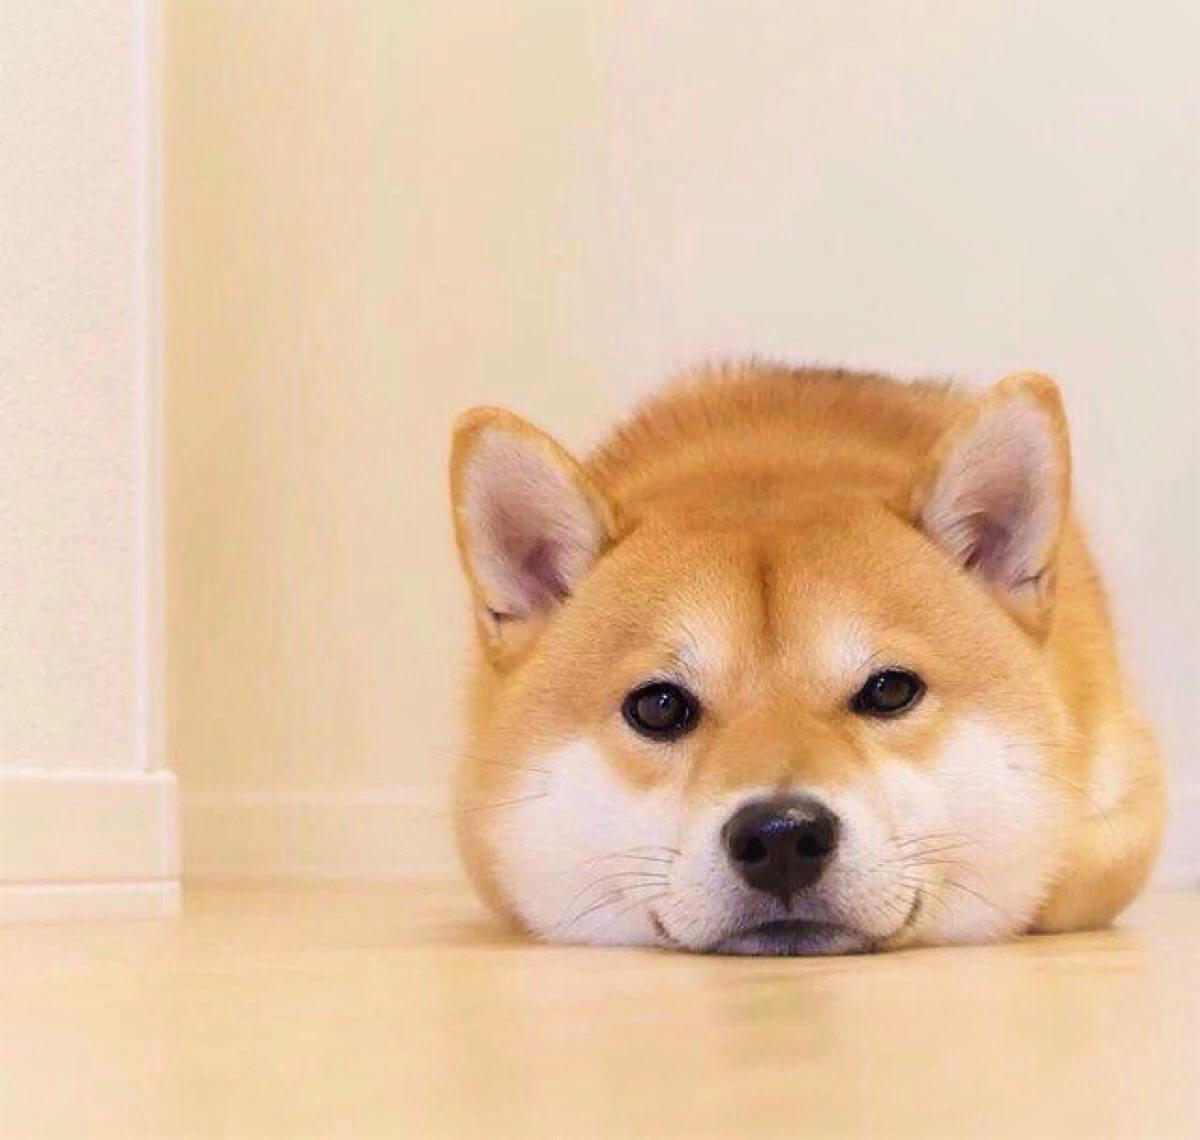 Pin By Shiba Tearoom On Shiba Shiba Inu Dog Shiba Puppy Japanese Dogs